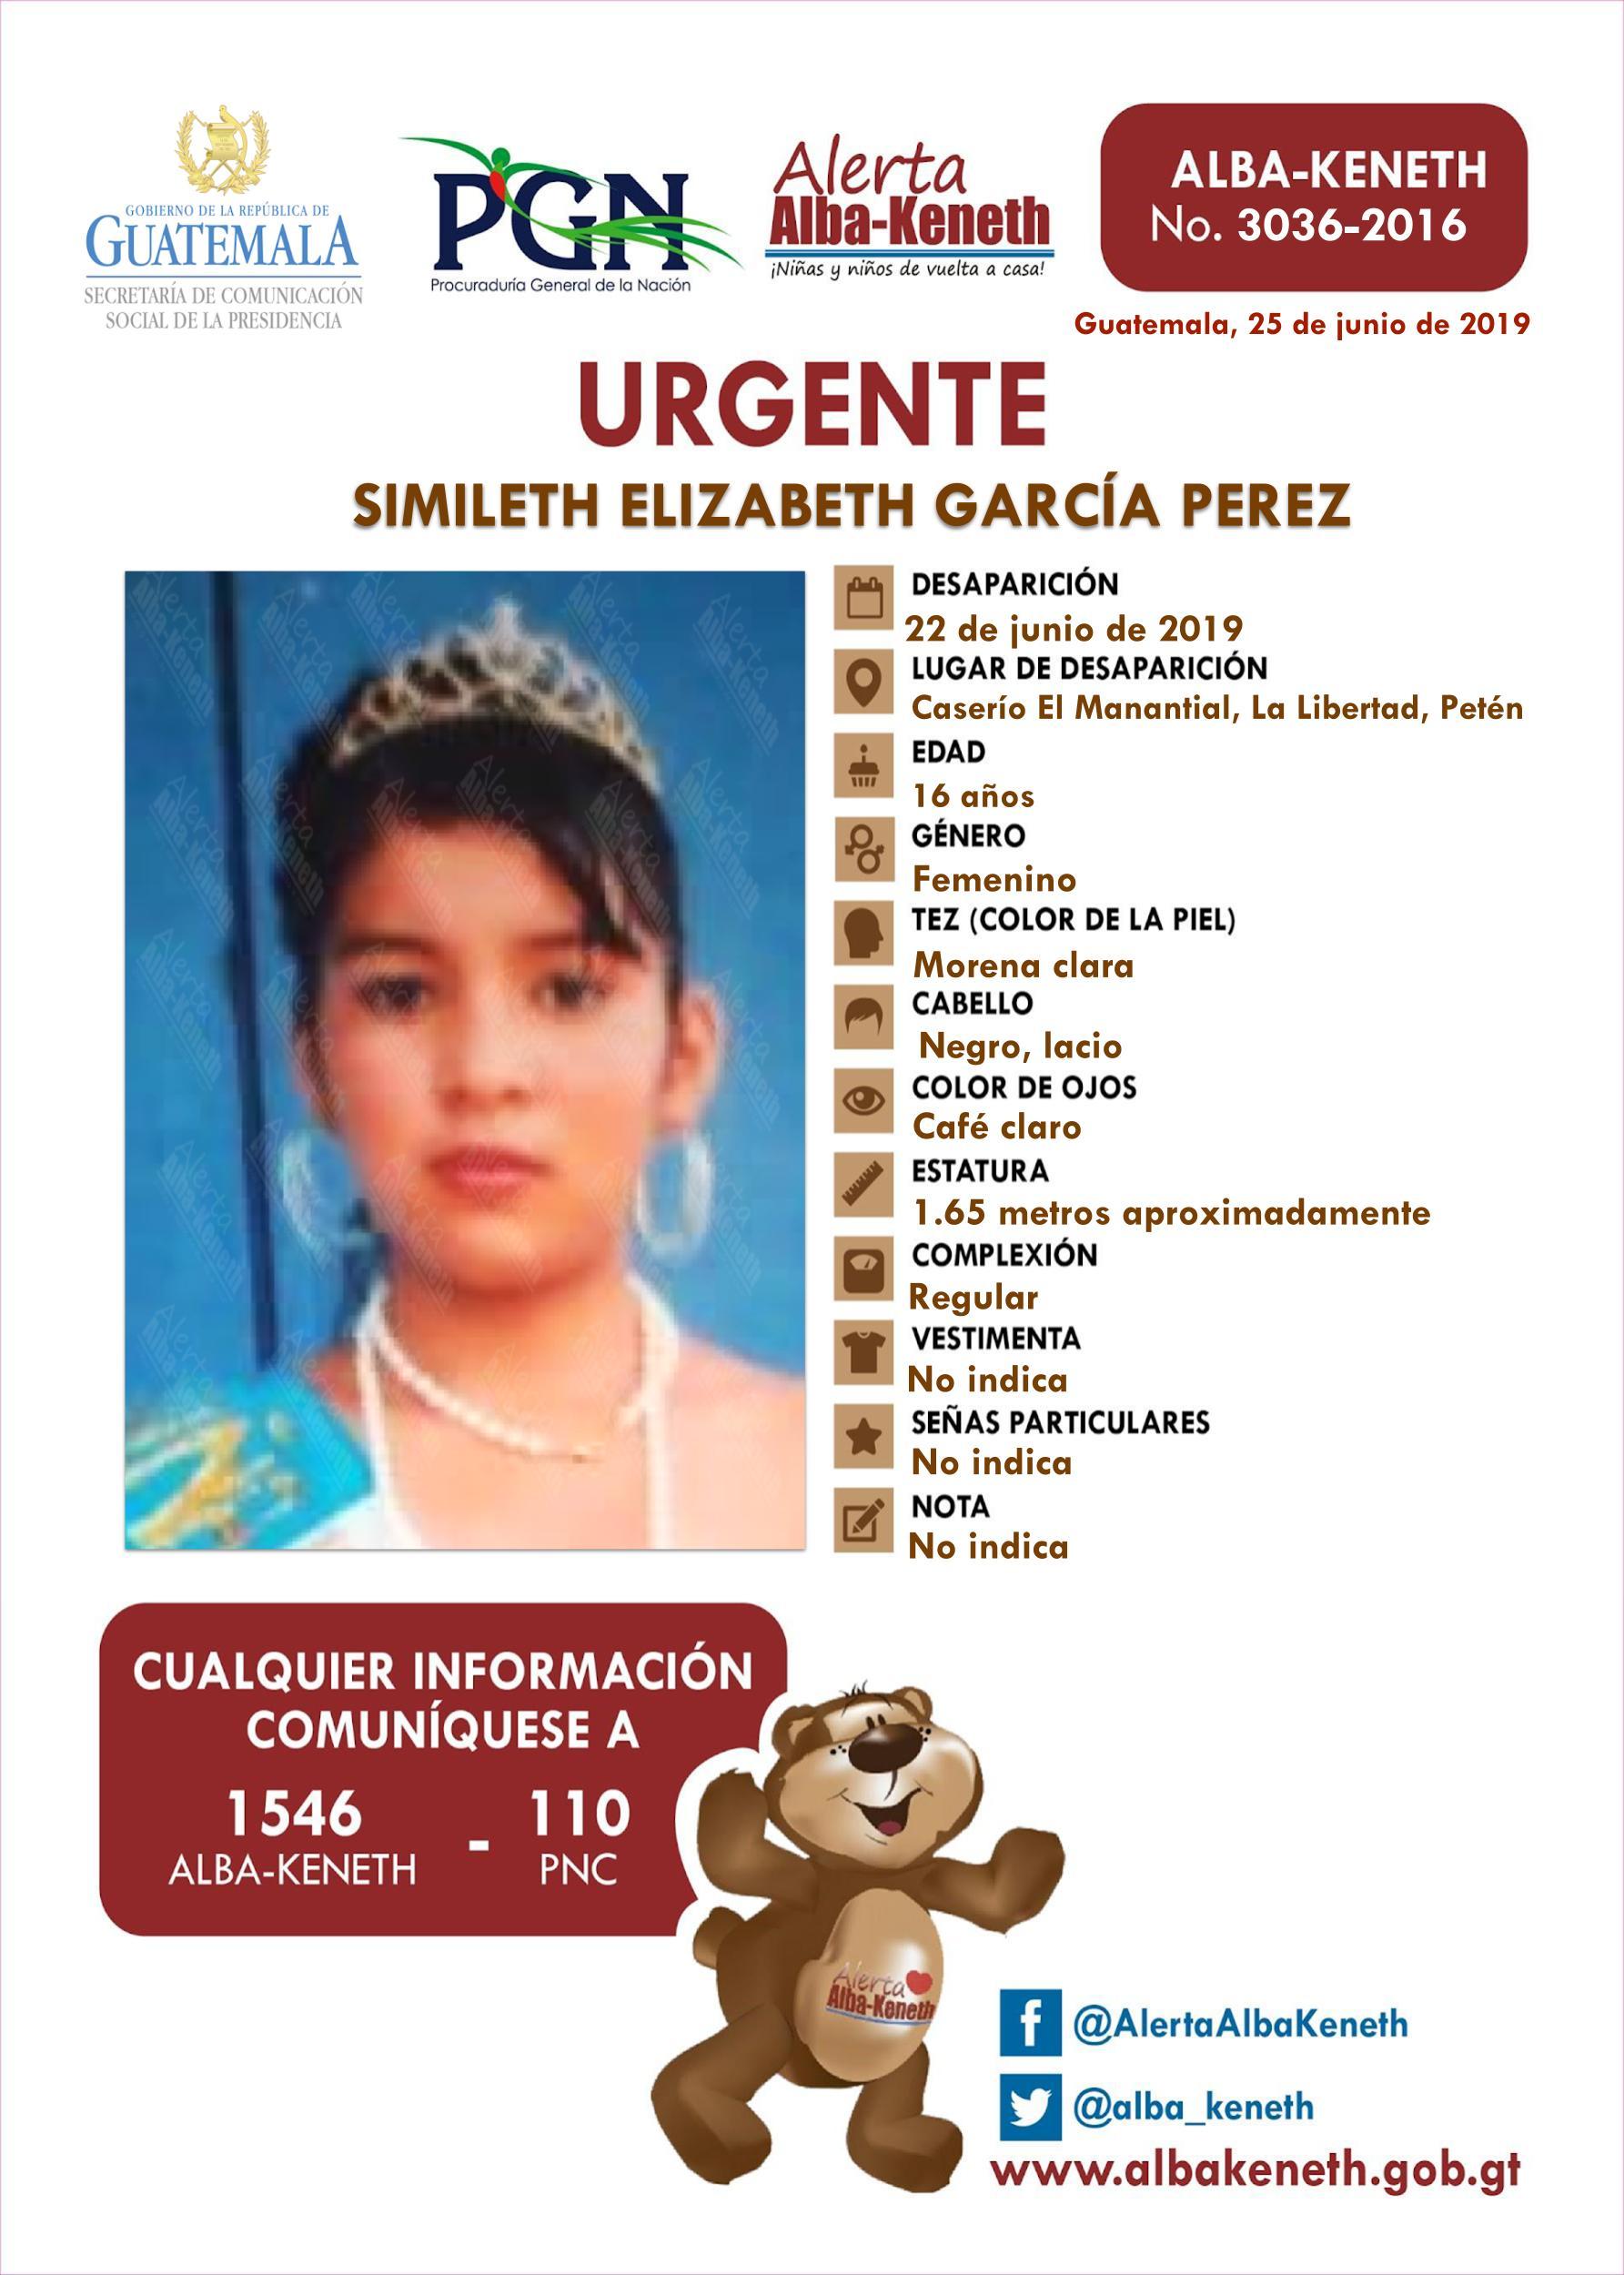 Simileth Elizabeth Garcia Perez